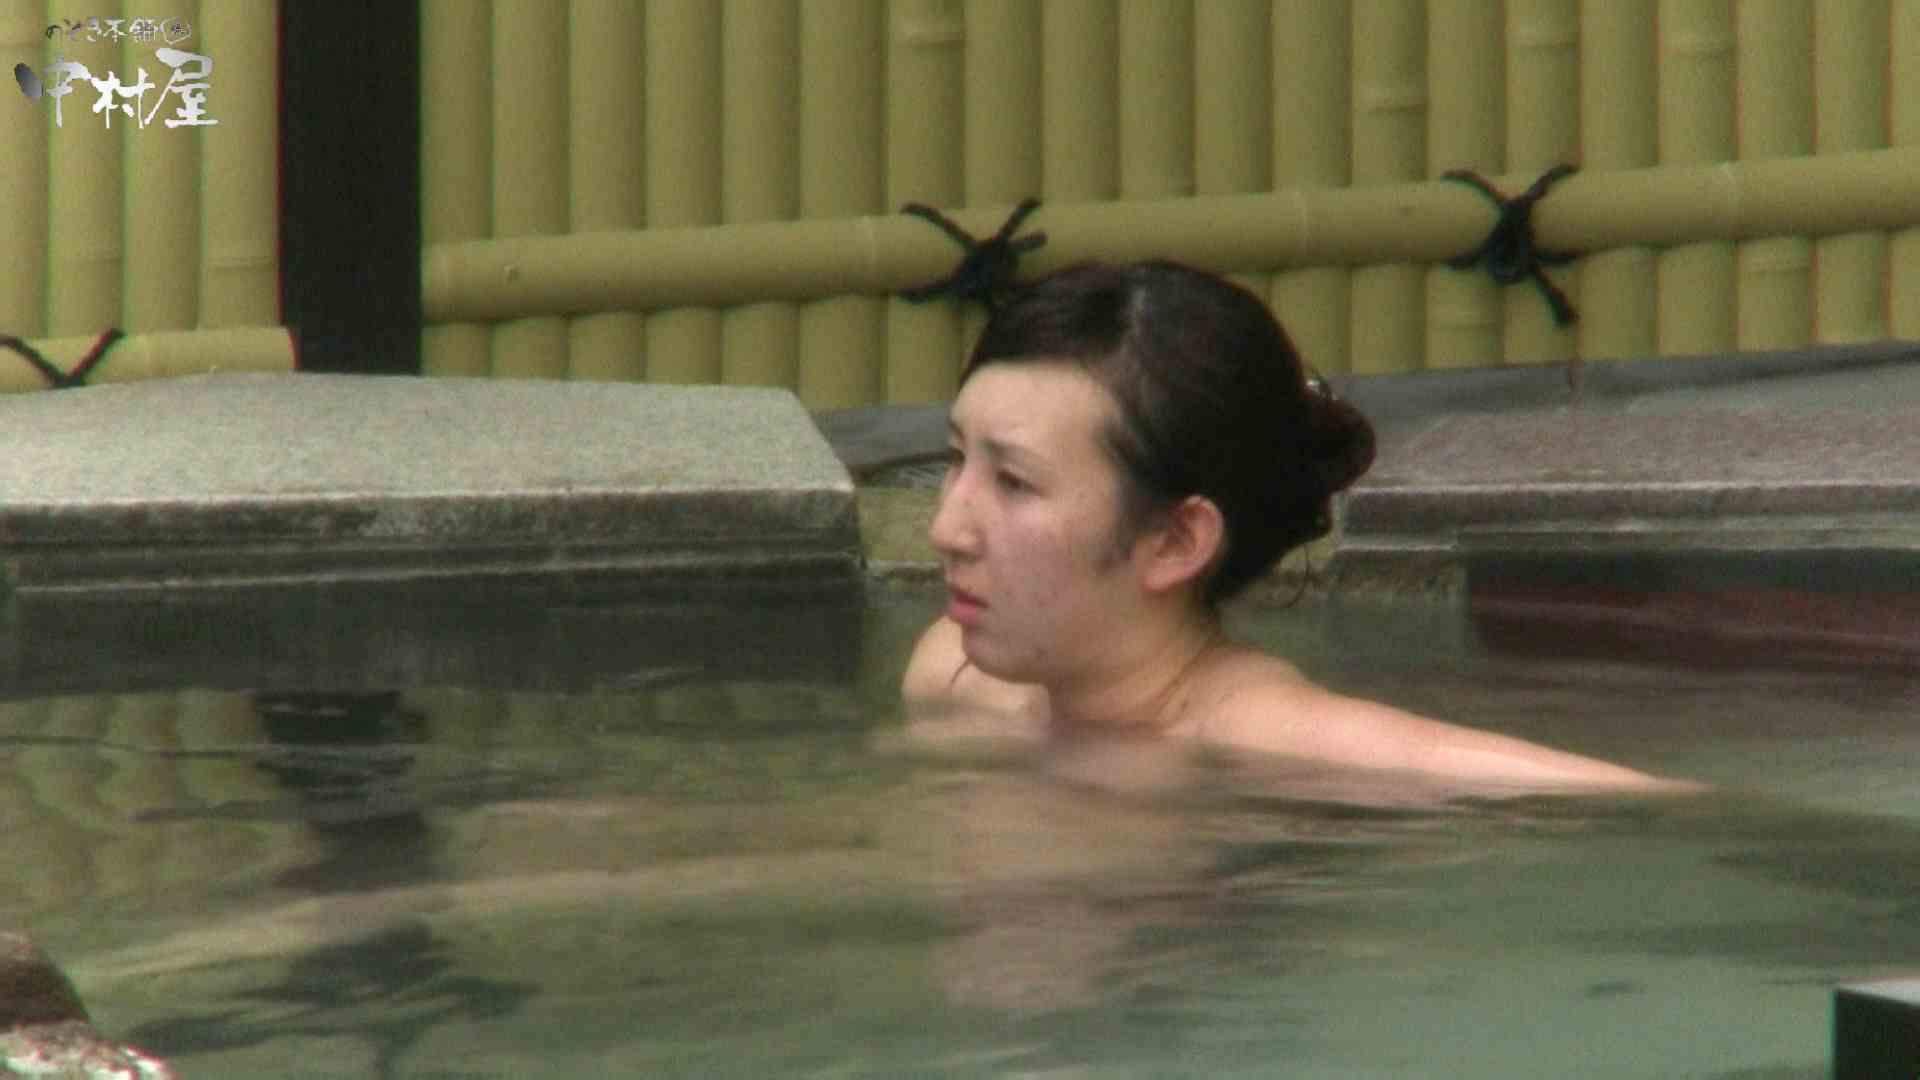 Aquaな露天風呂Vol.948 盗撮   HなOL  78pic 10